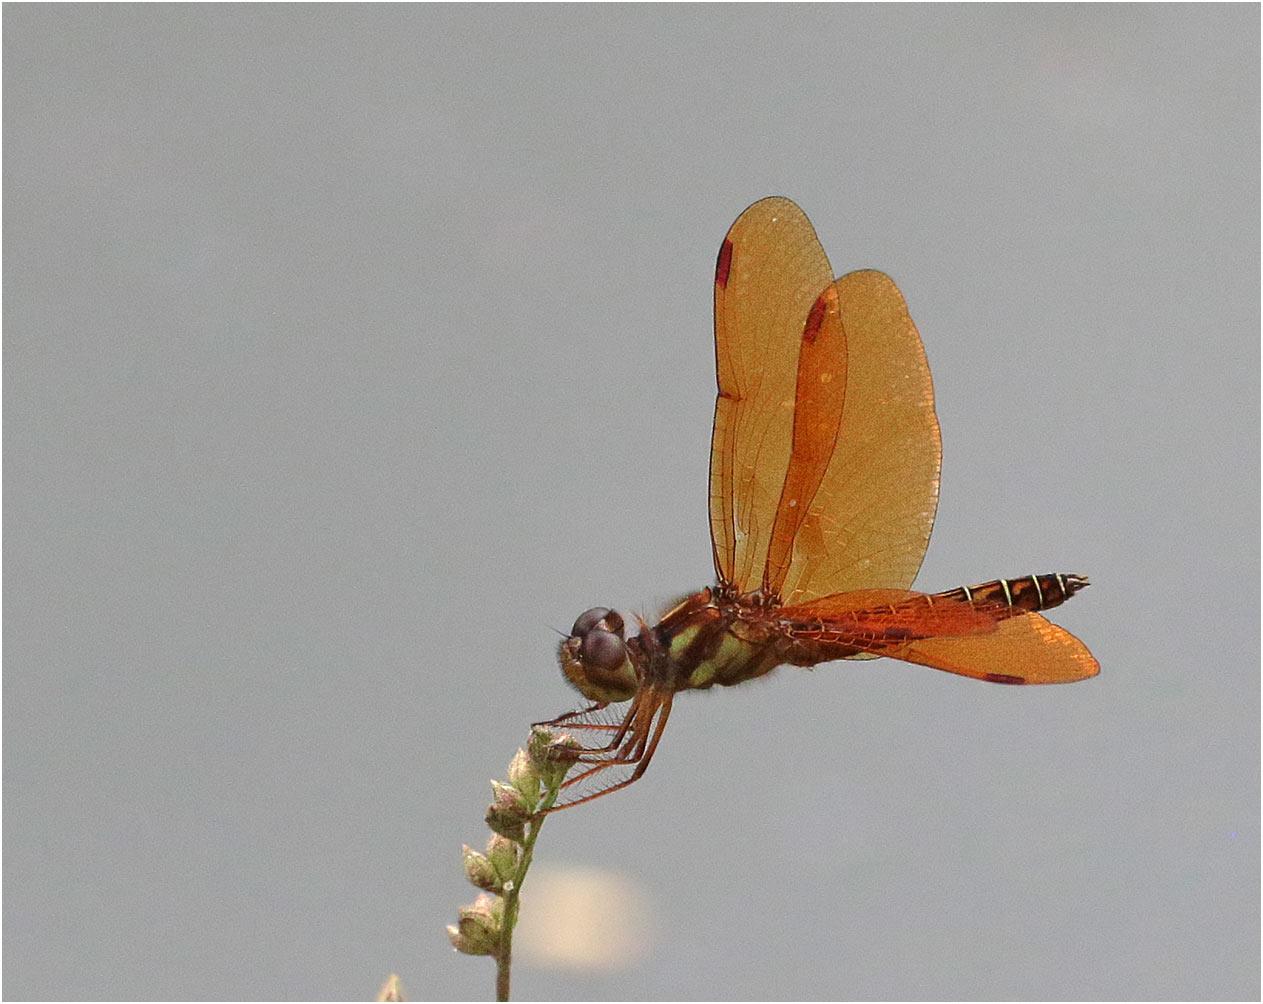 Perithemis mooma, Laguna de las ilusiones, Villahermosa, Tabasco, 28/10/2019